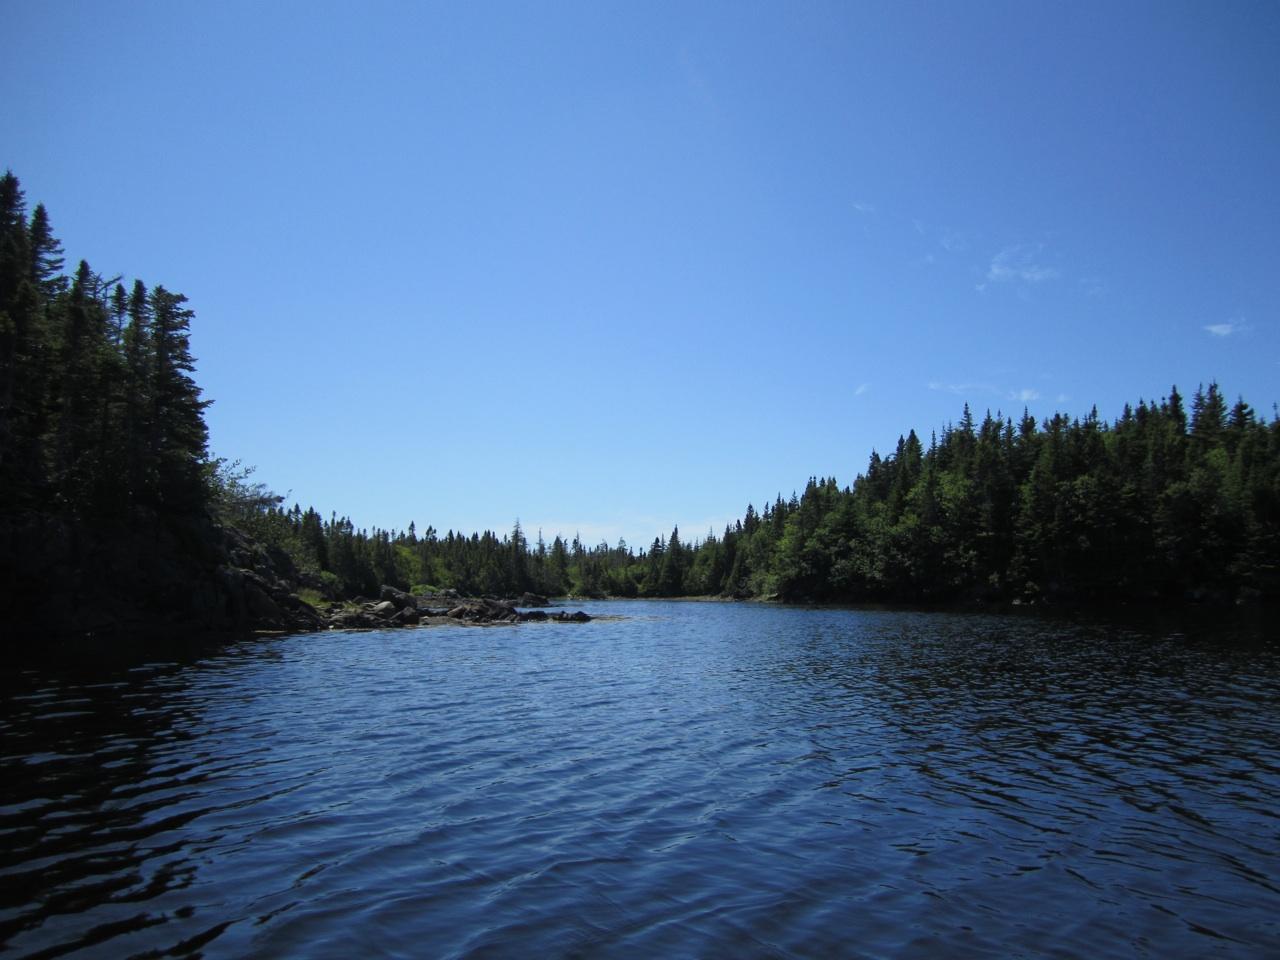 Our Kayaking Adventure